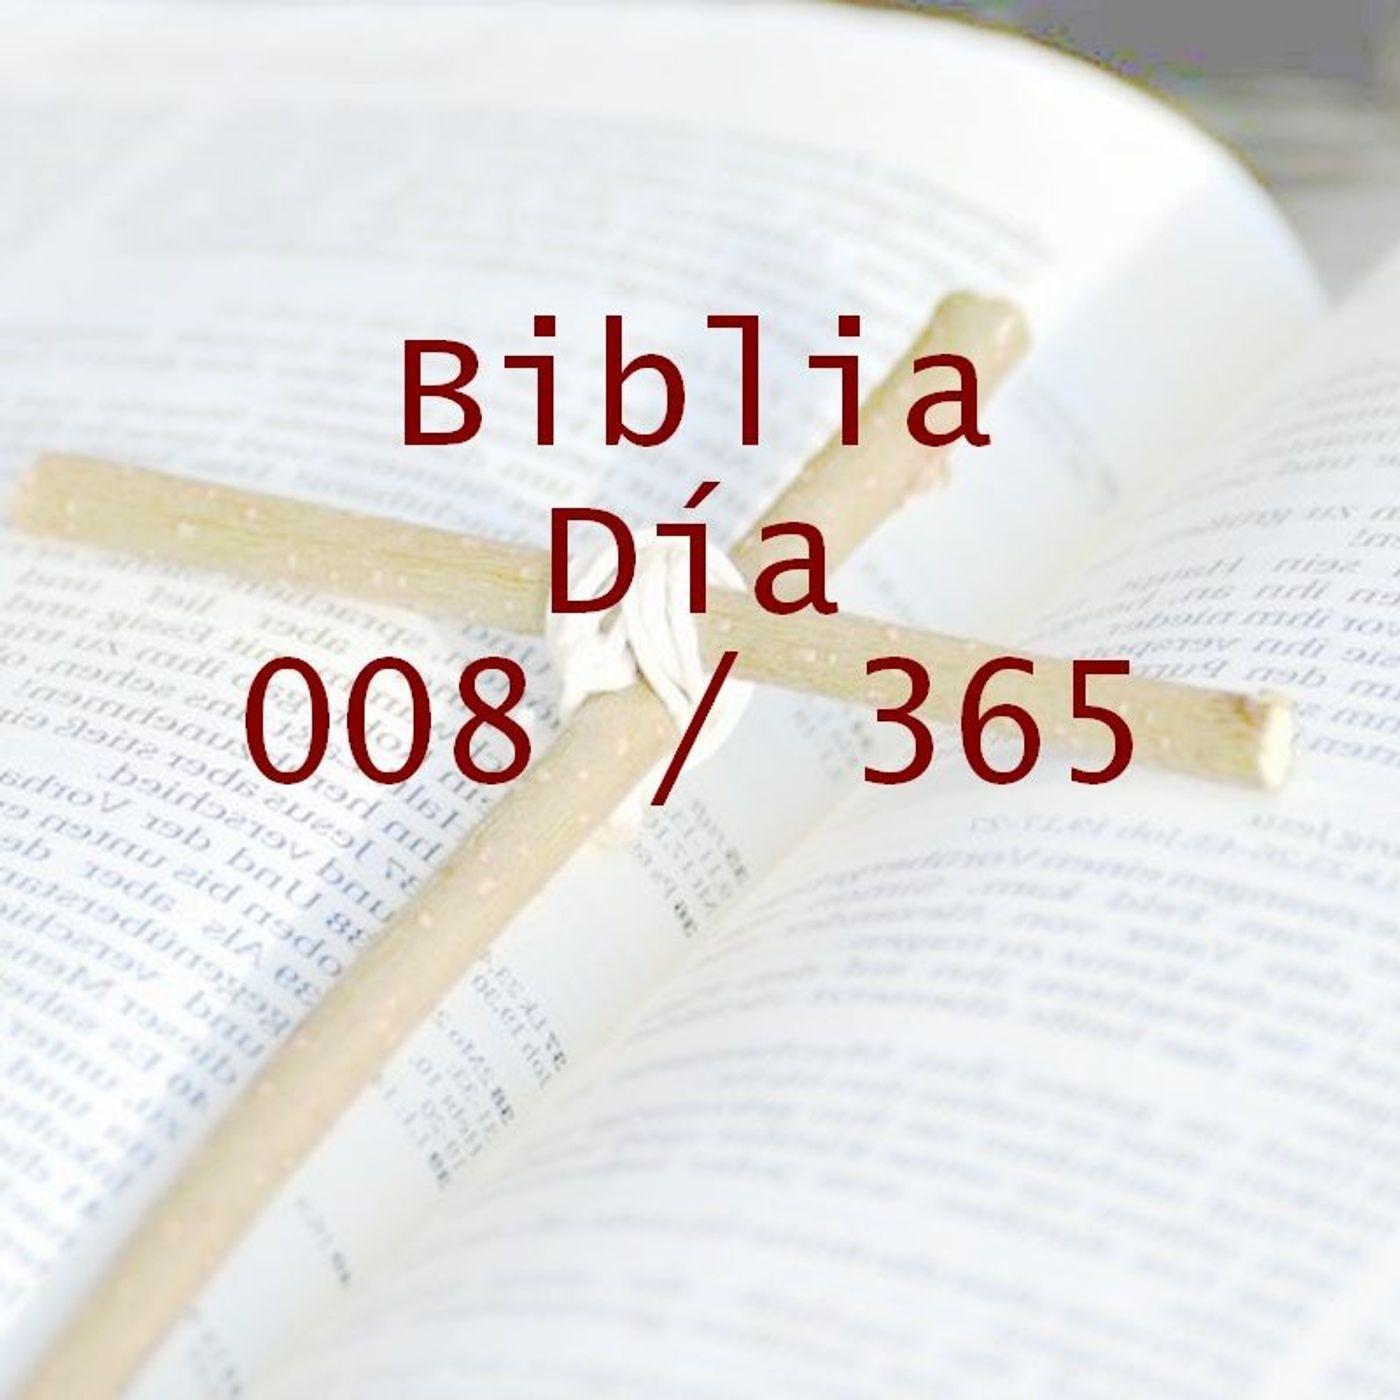 365 dias para la Biblia - Dia 008